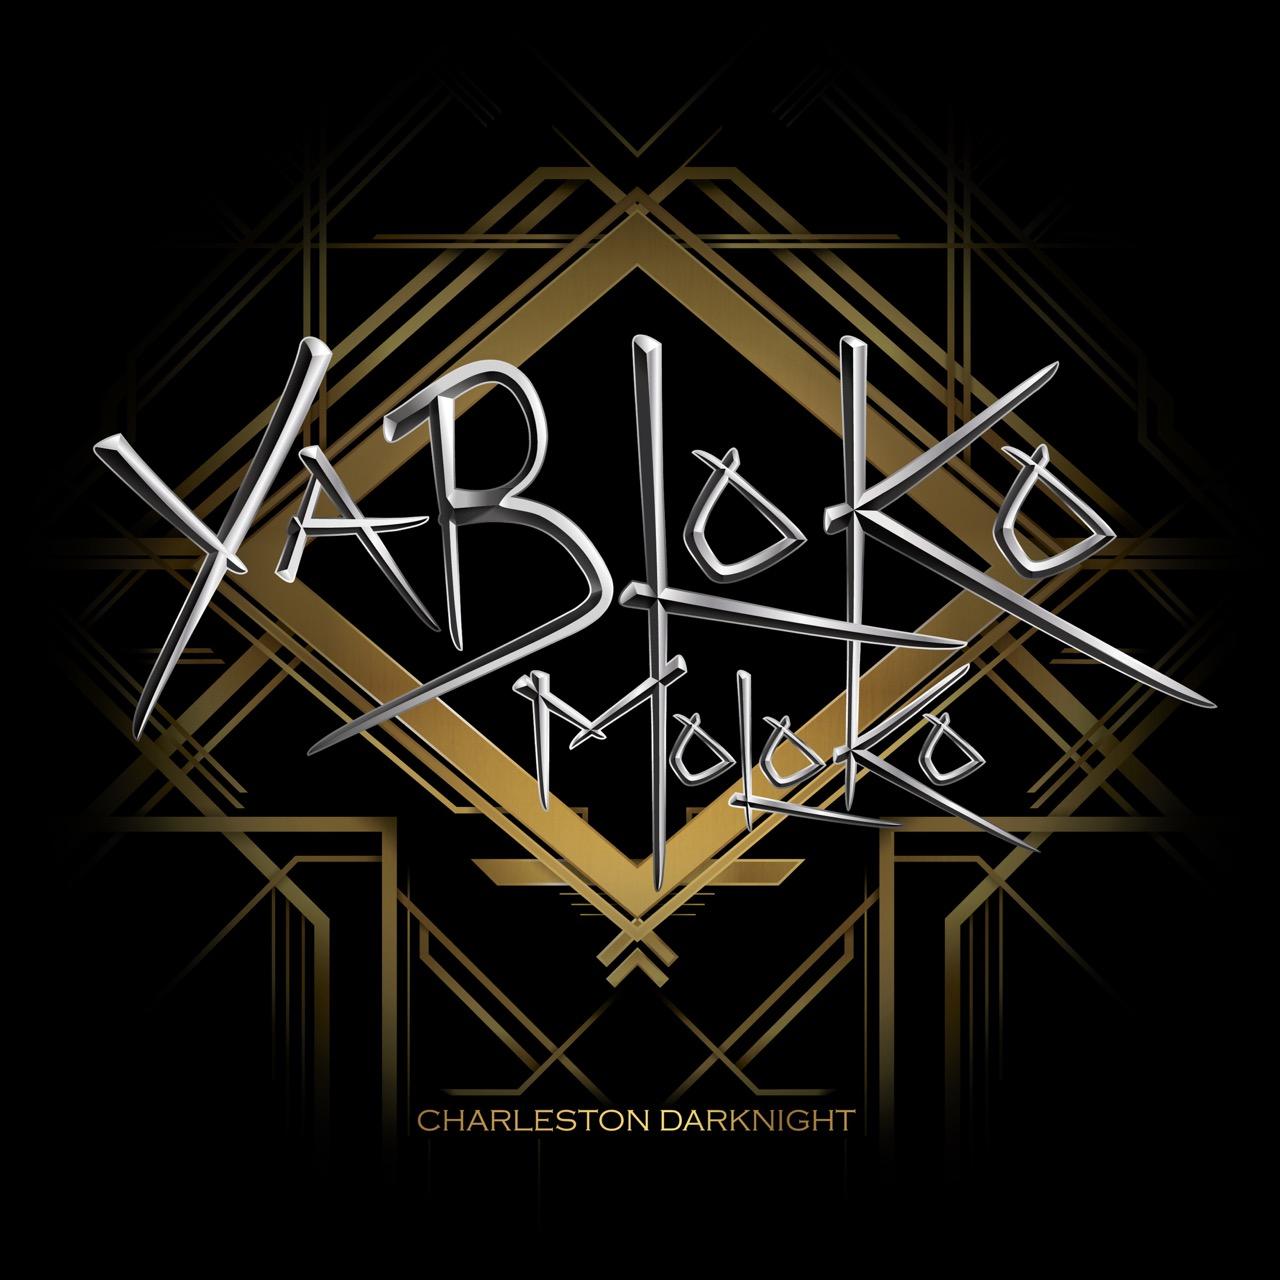 "Charleston Darknight by Yabloko Moloko Limited 12"" Electro Swing Vinyl"